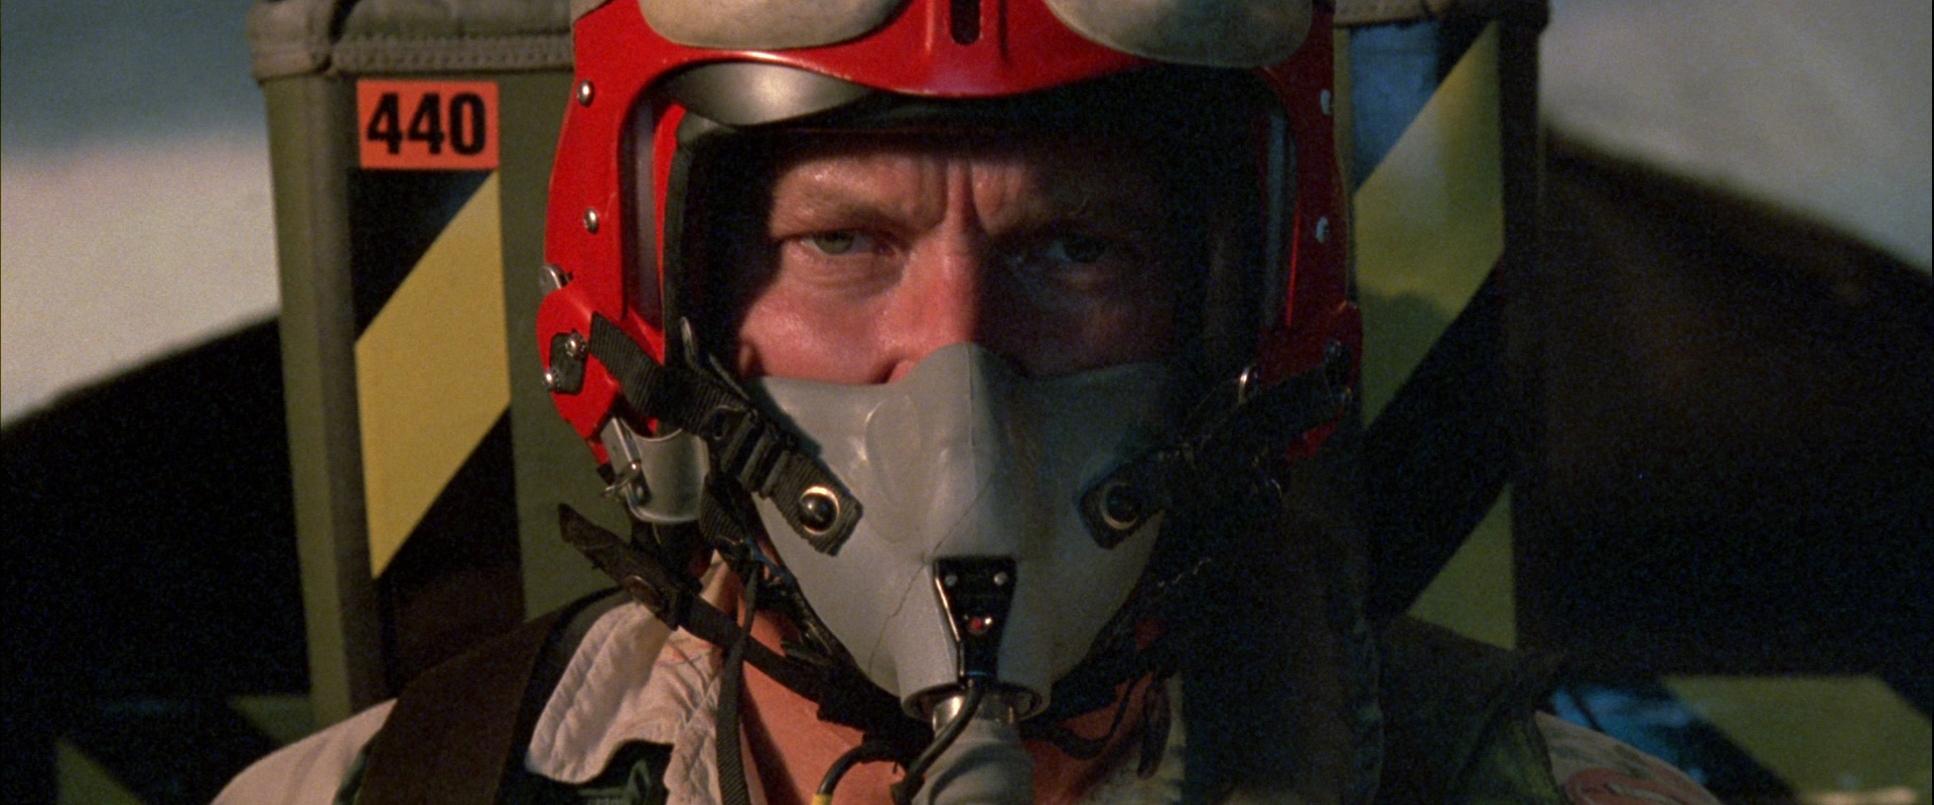 Russell Casses Randy Quaid Flight Suit Costume Prop